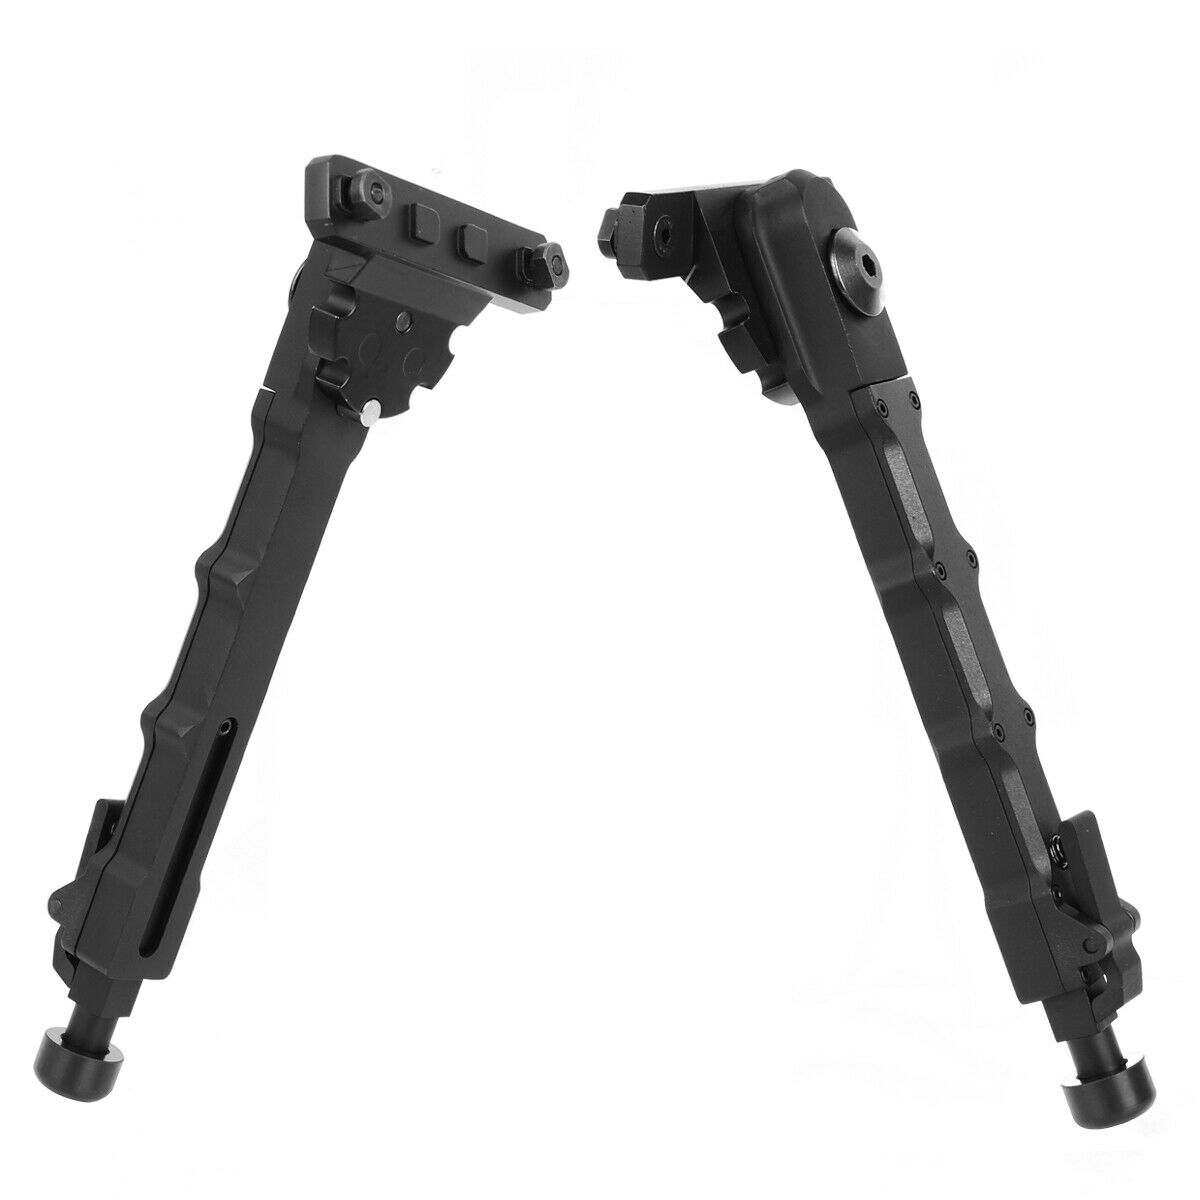 m lok 7 5 9 rifle bipod